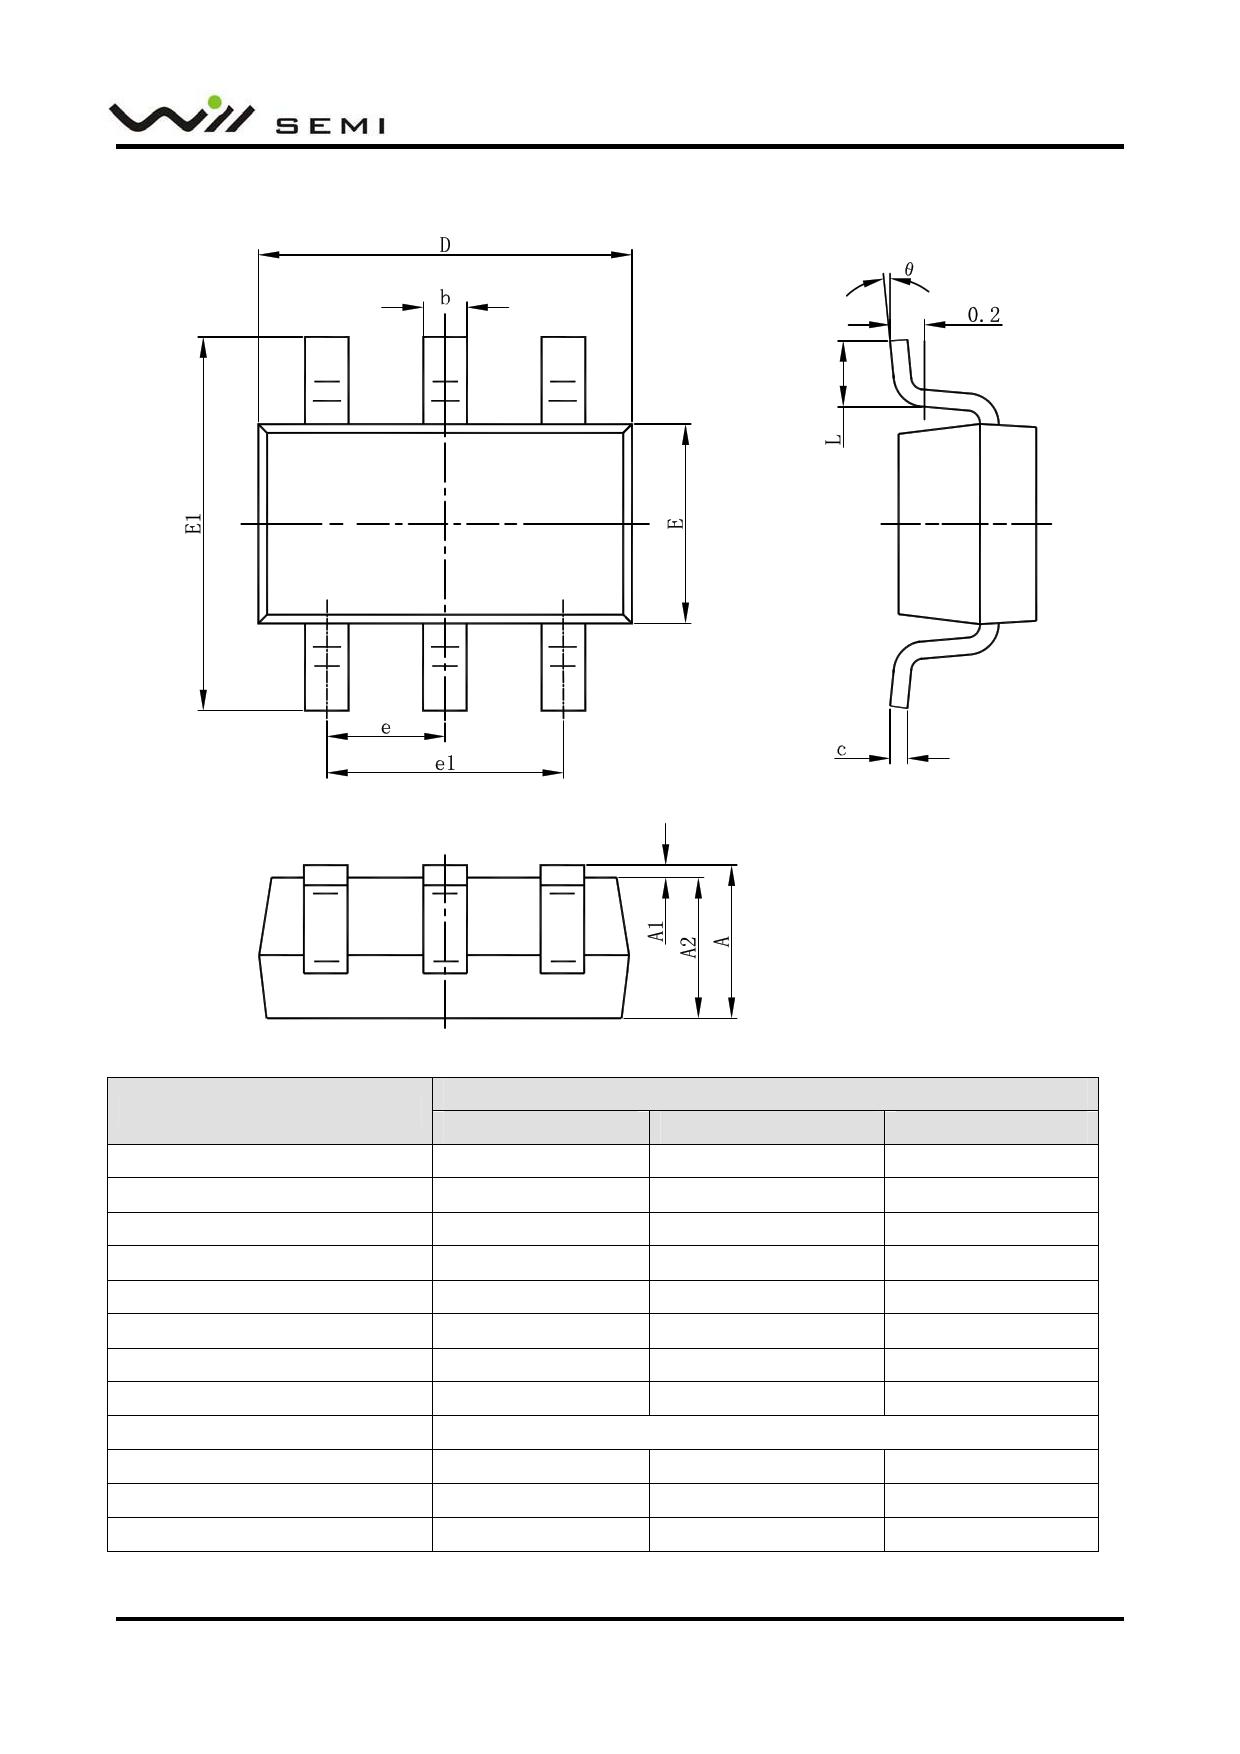 WPM2037 Datasheet, Funktion